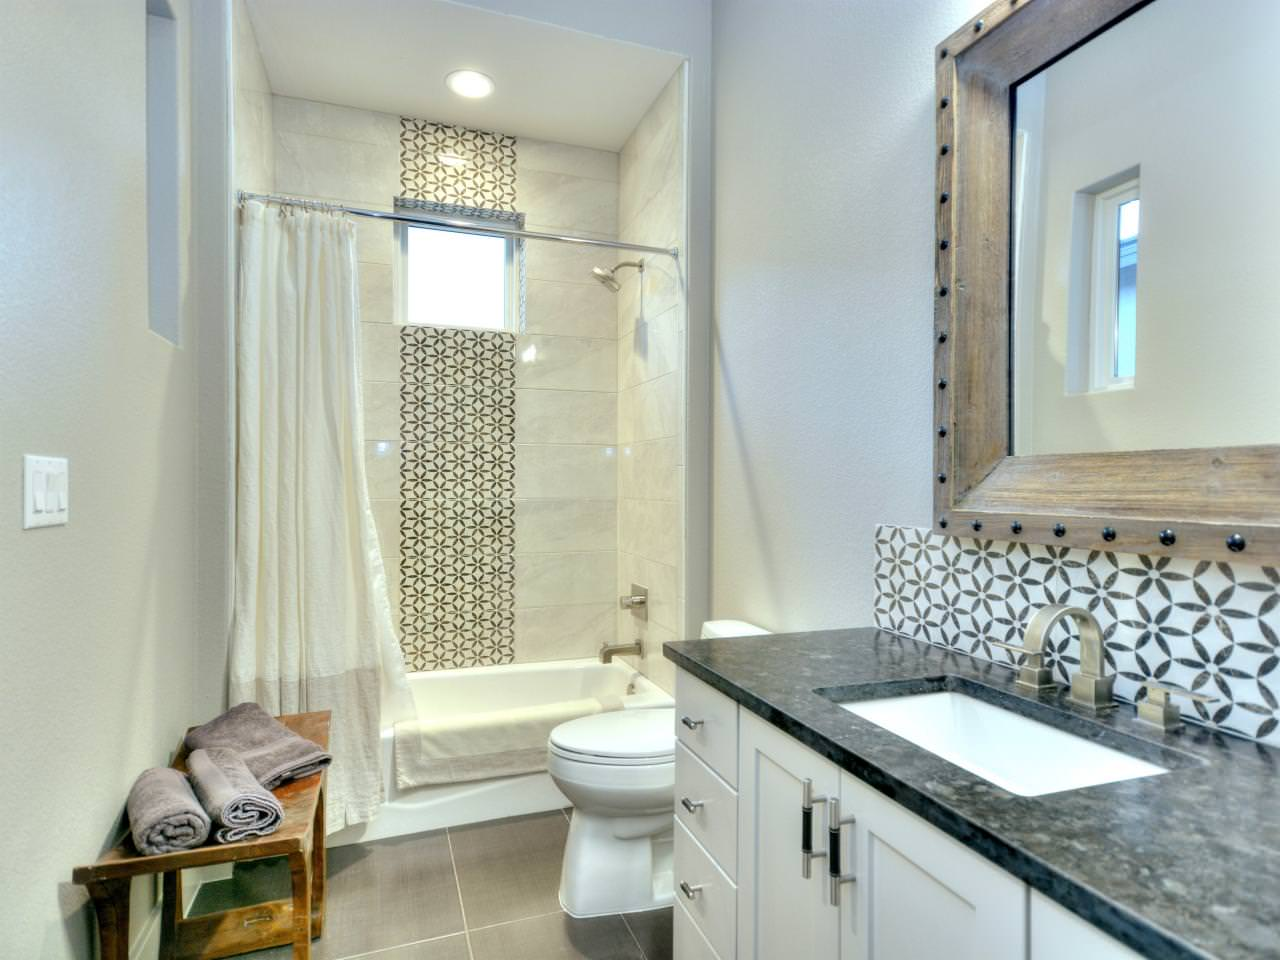 Geometrical Design Bathroom Floor Tile: Geometric Tiles